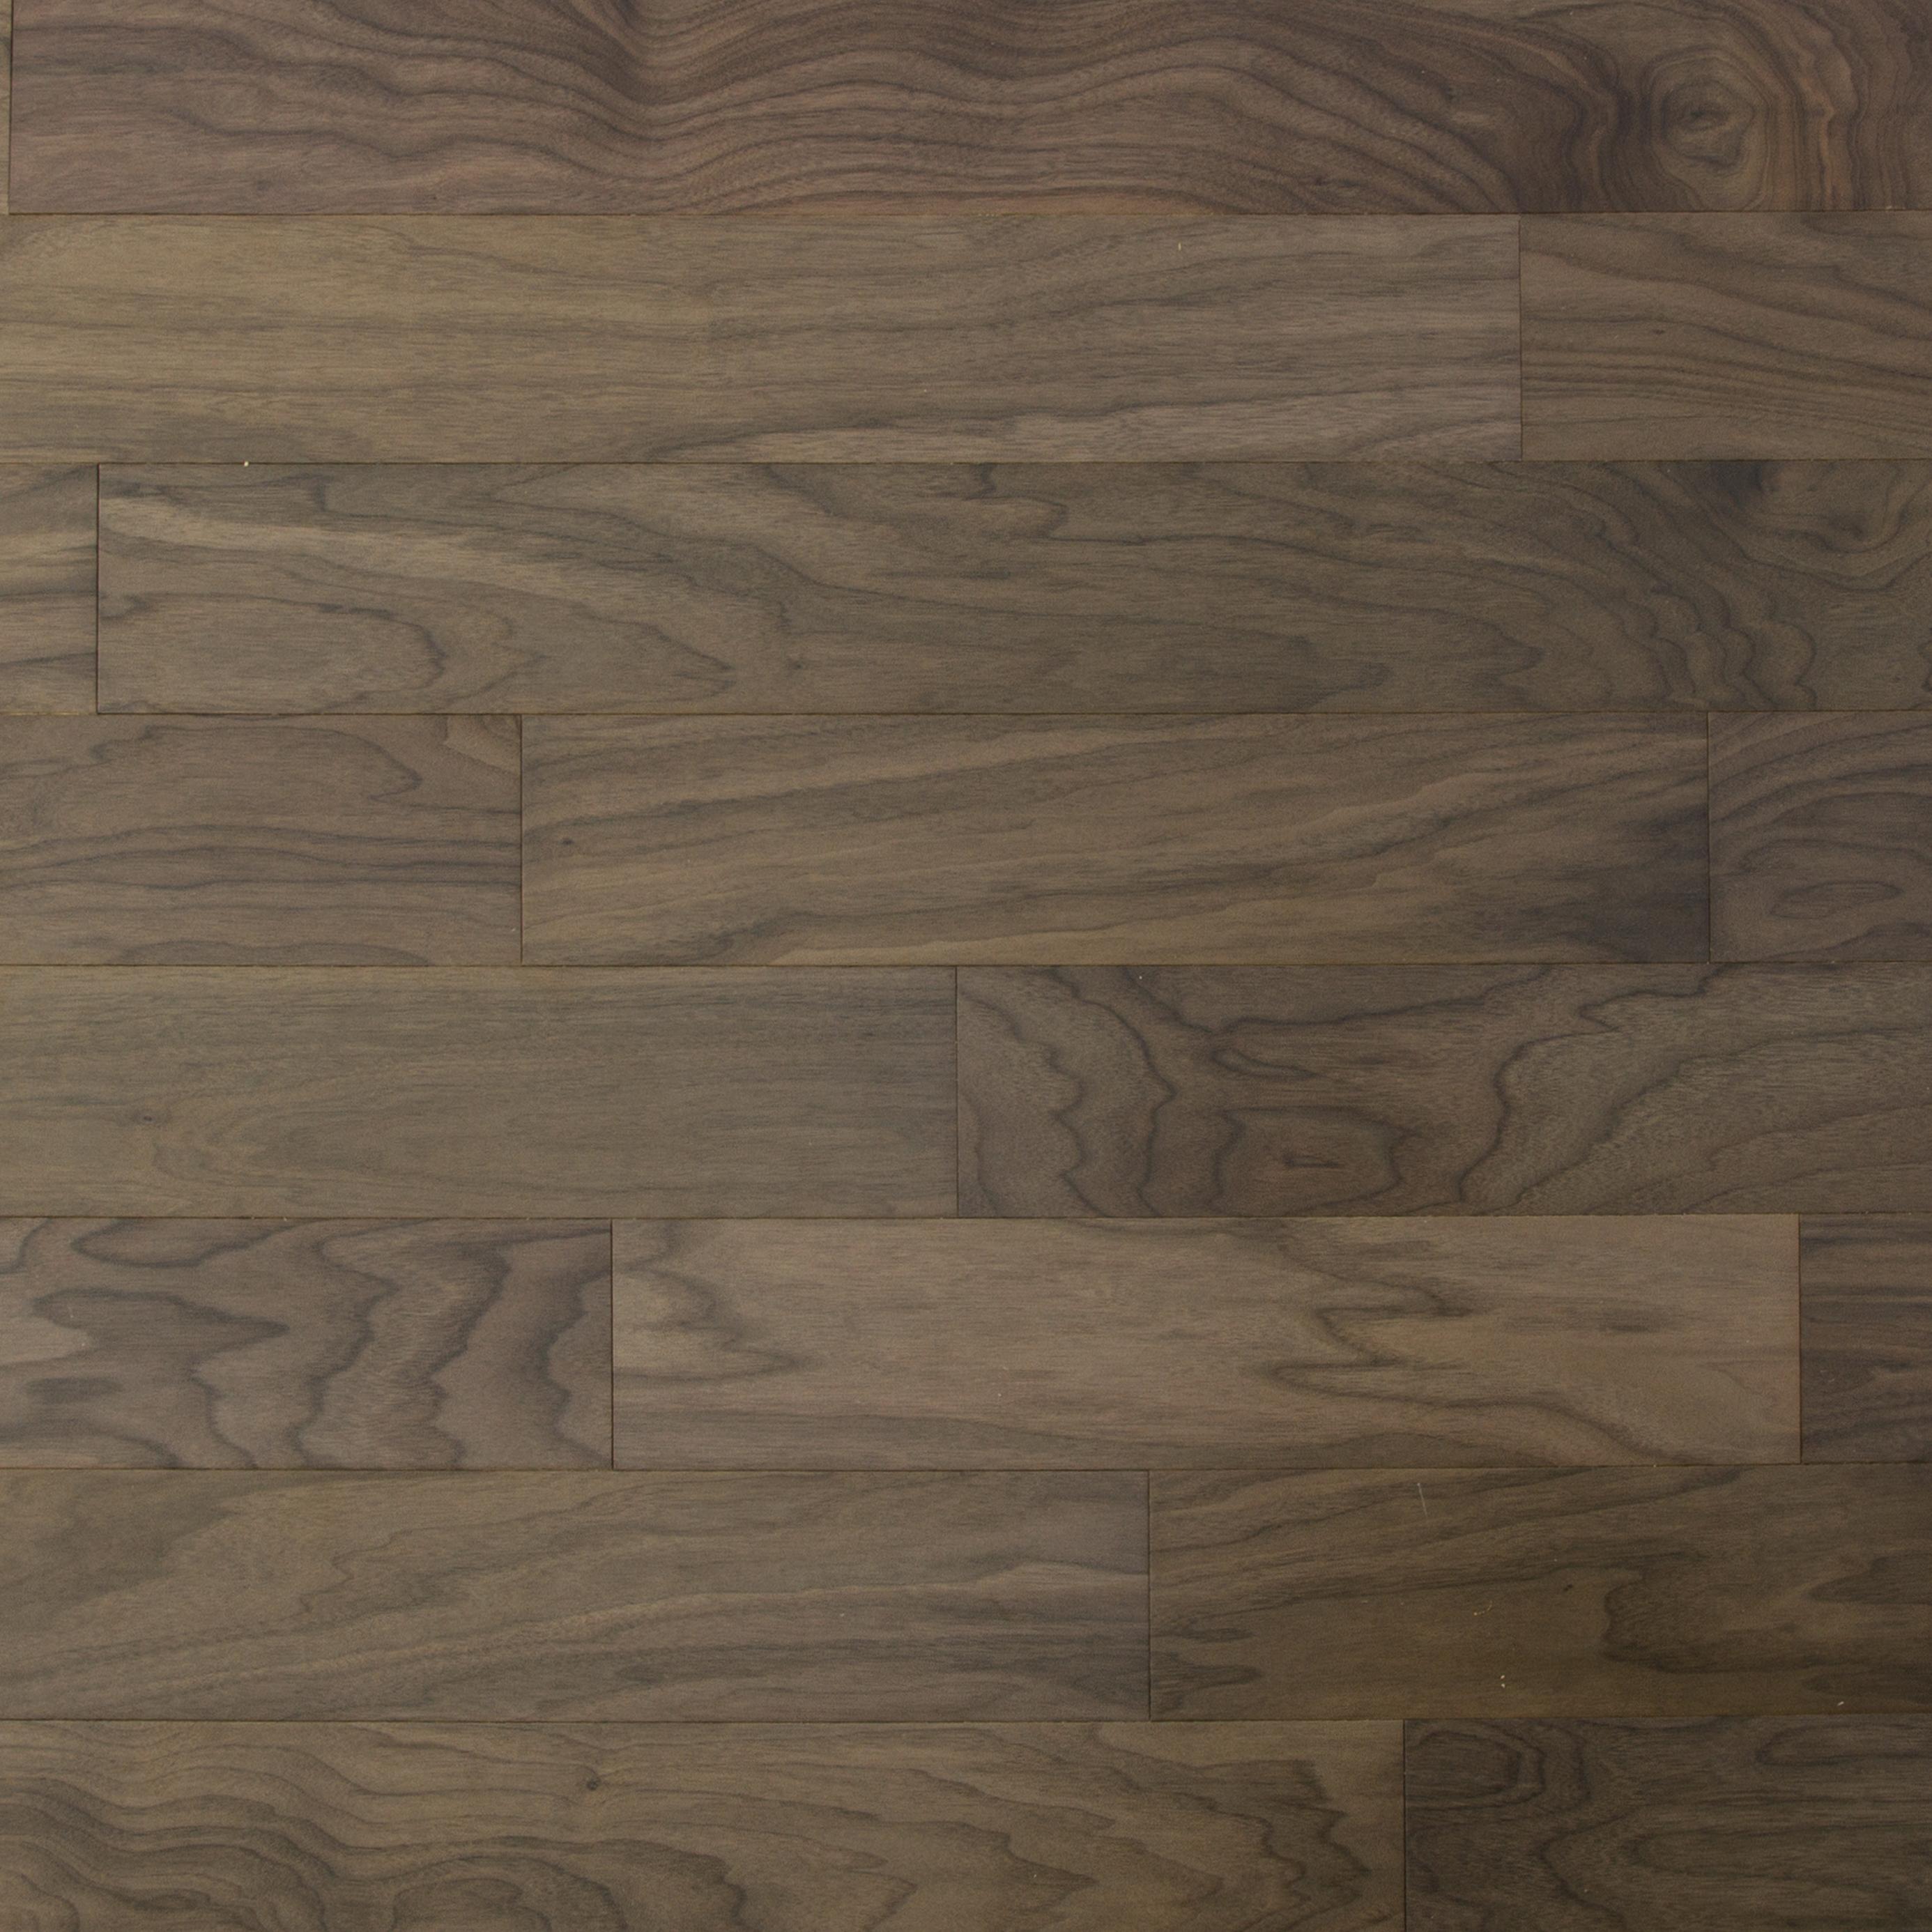 Engineer floor American Walnut – Natural